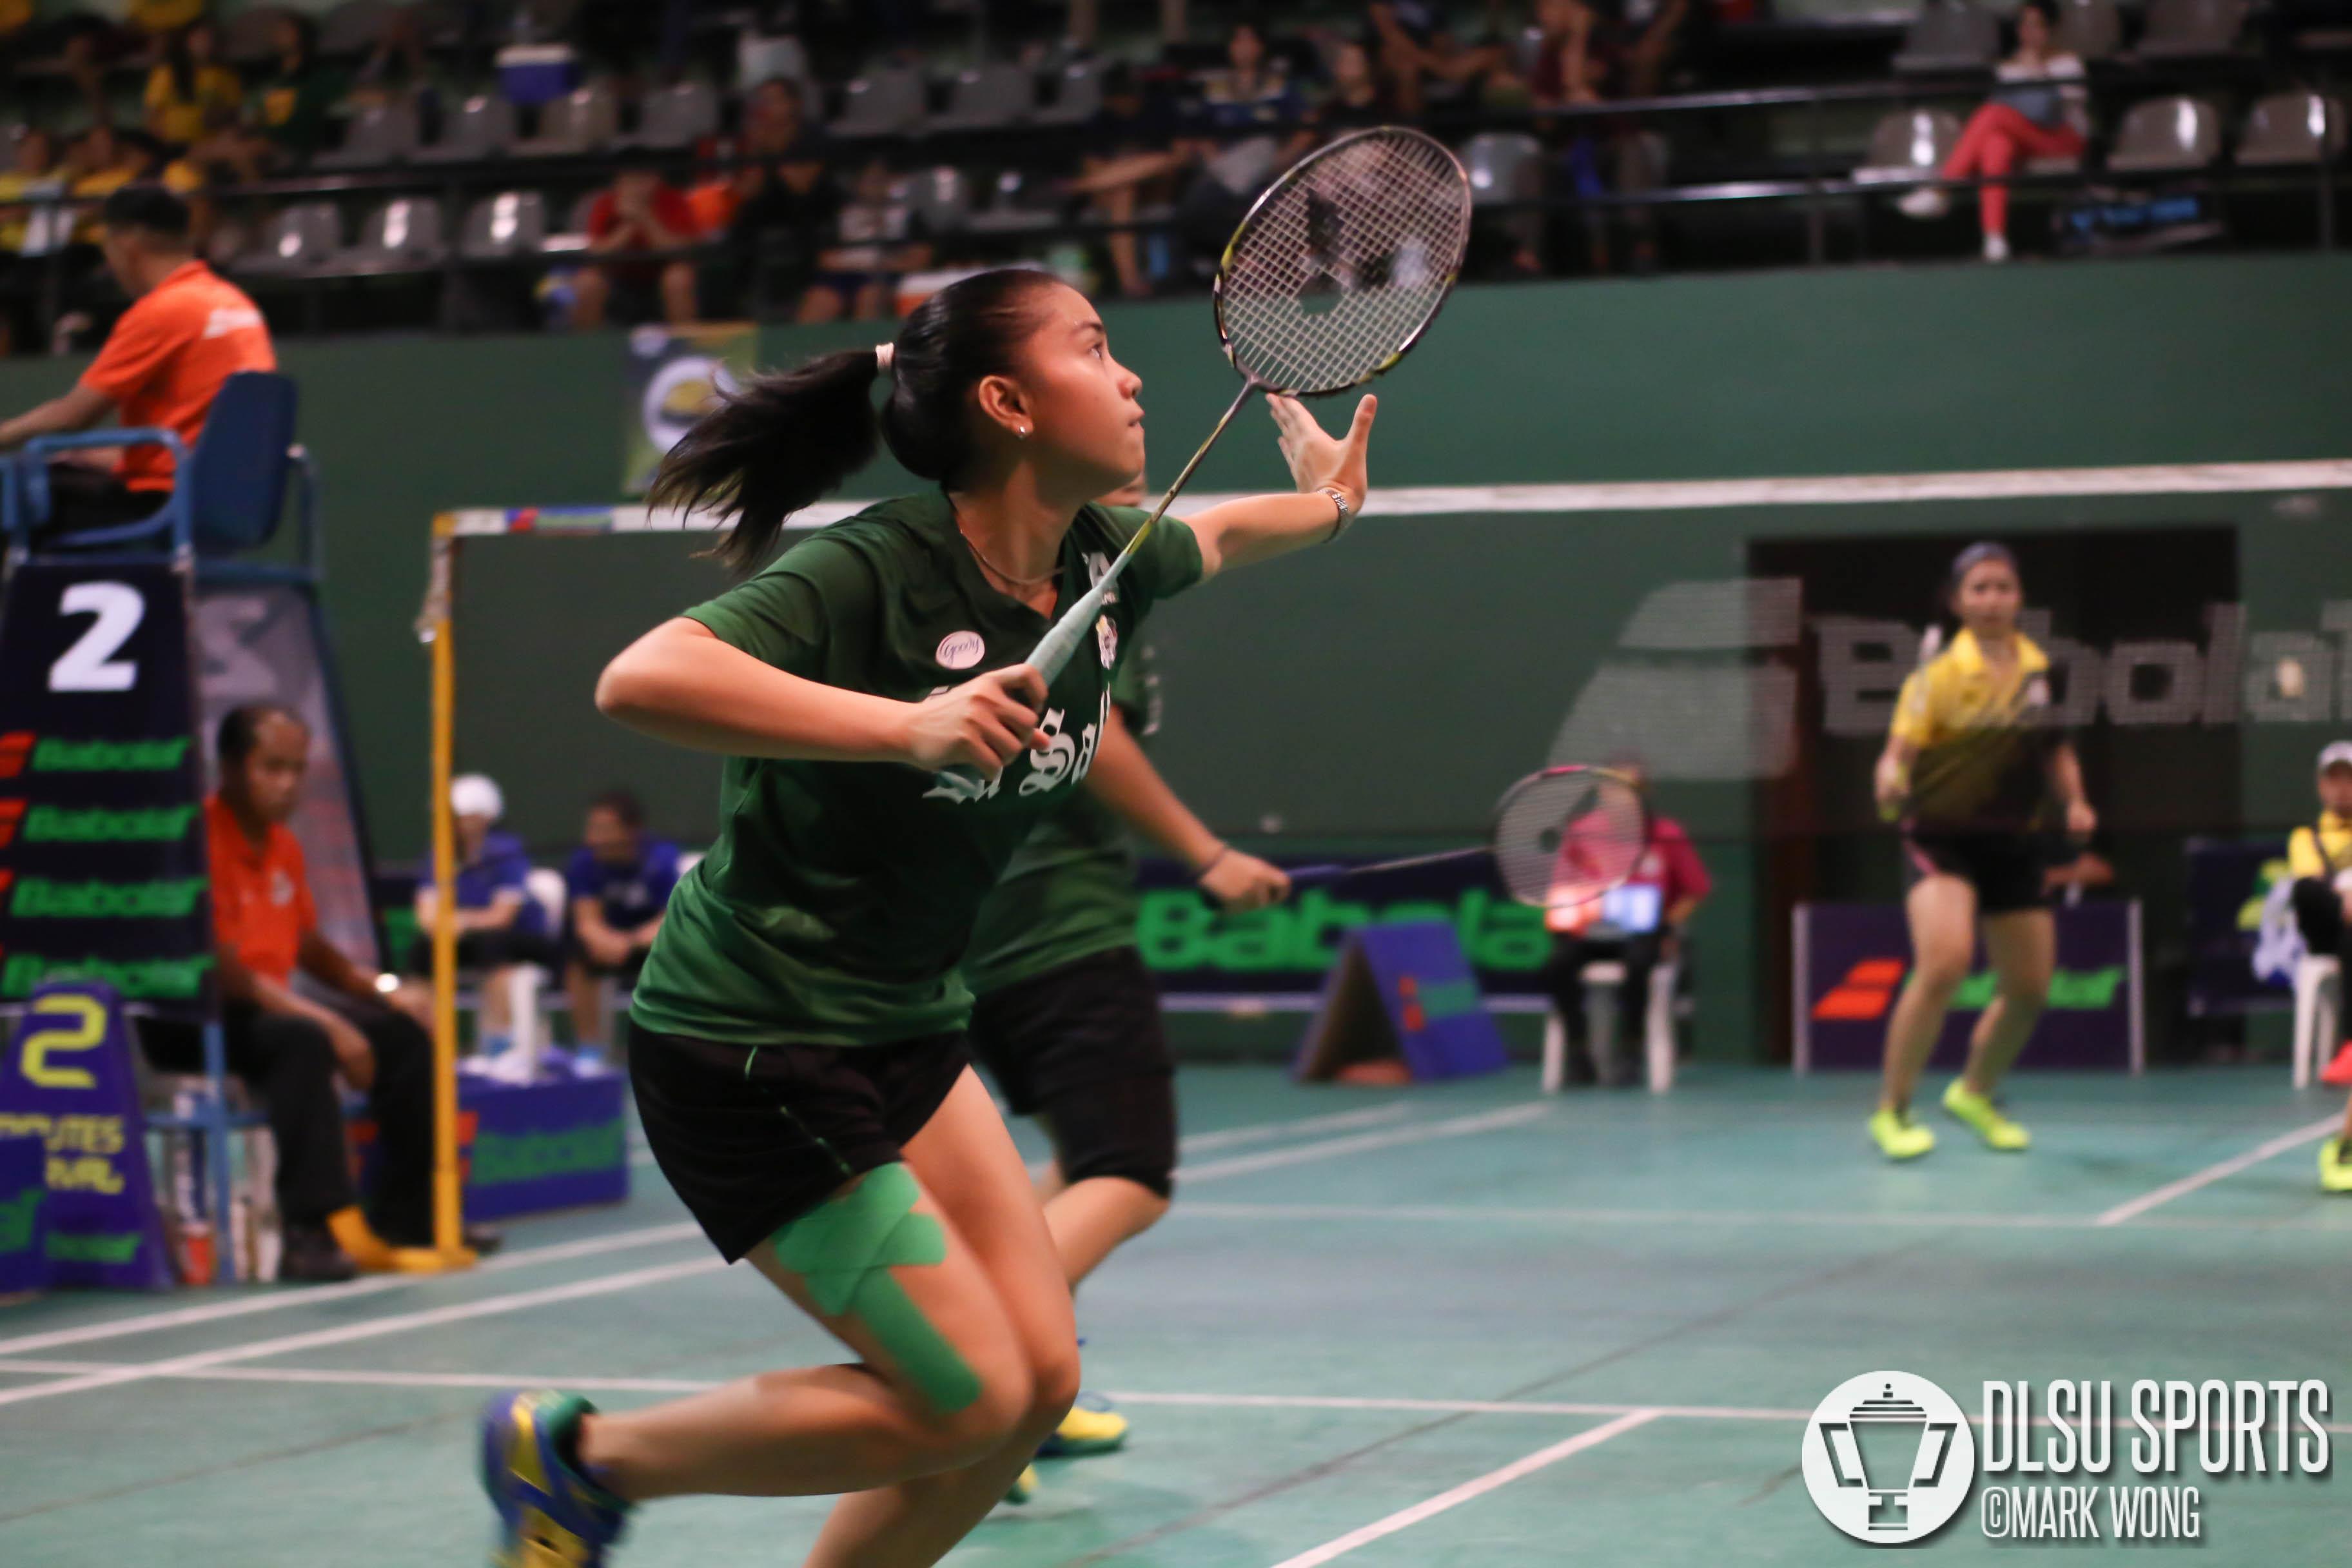 uaap-badminton-d4-8-2